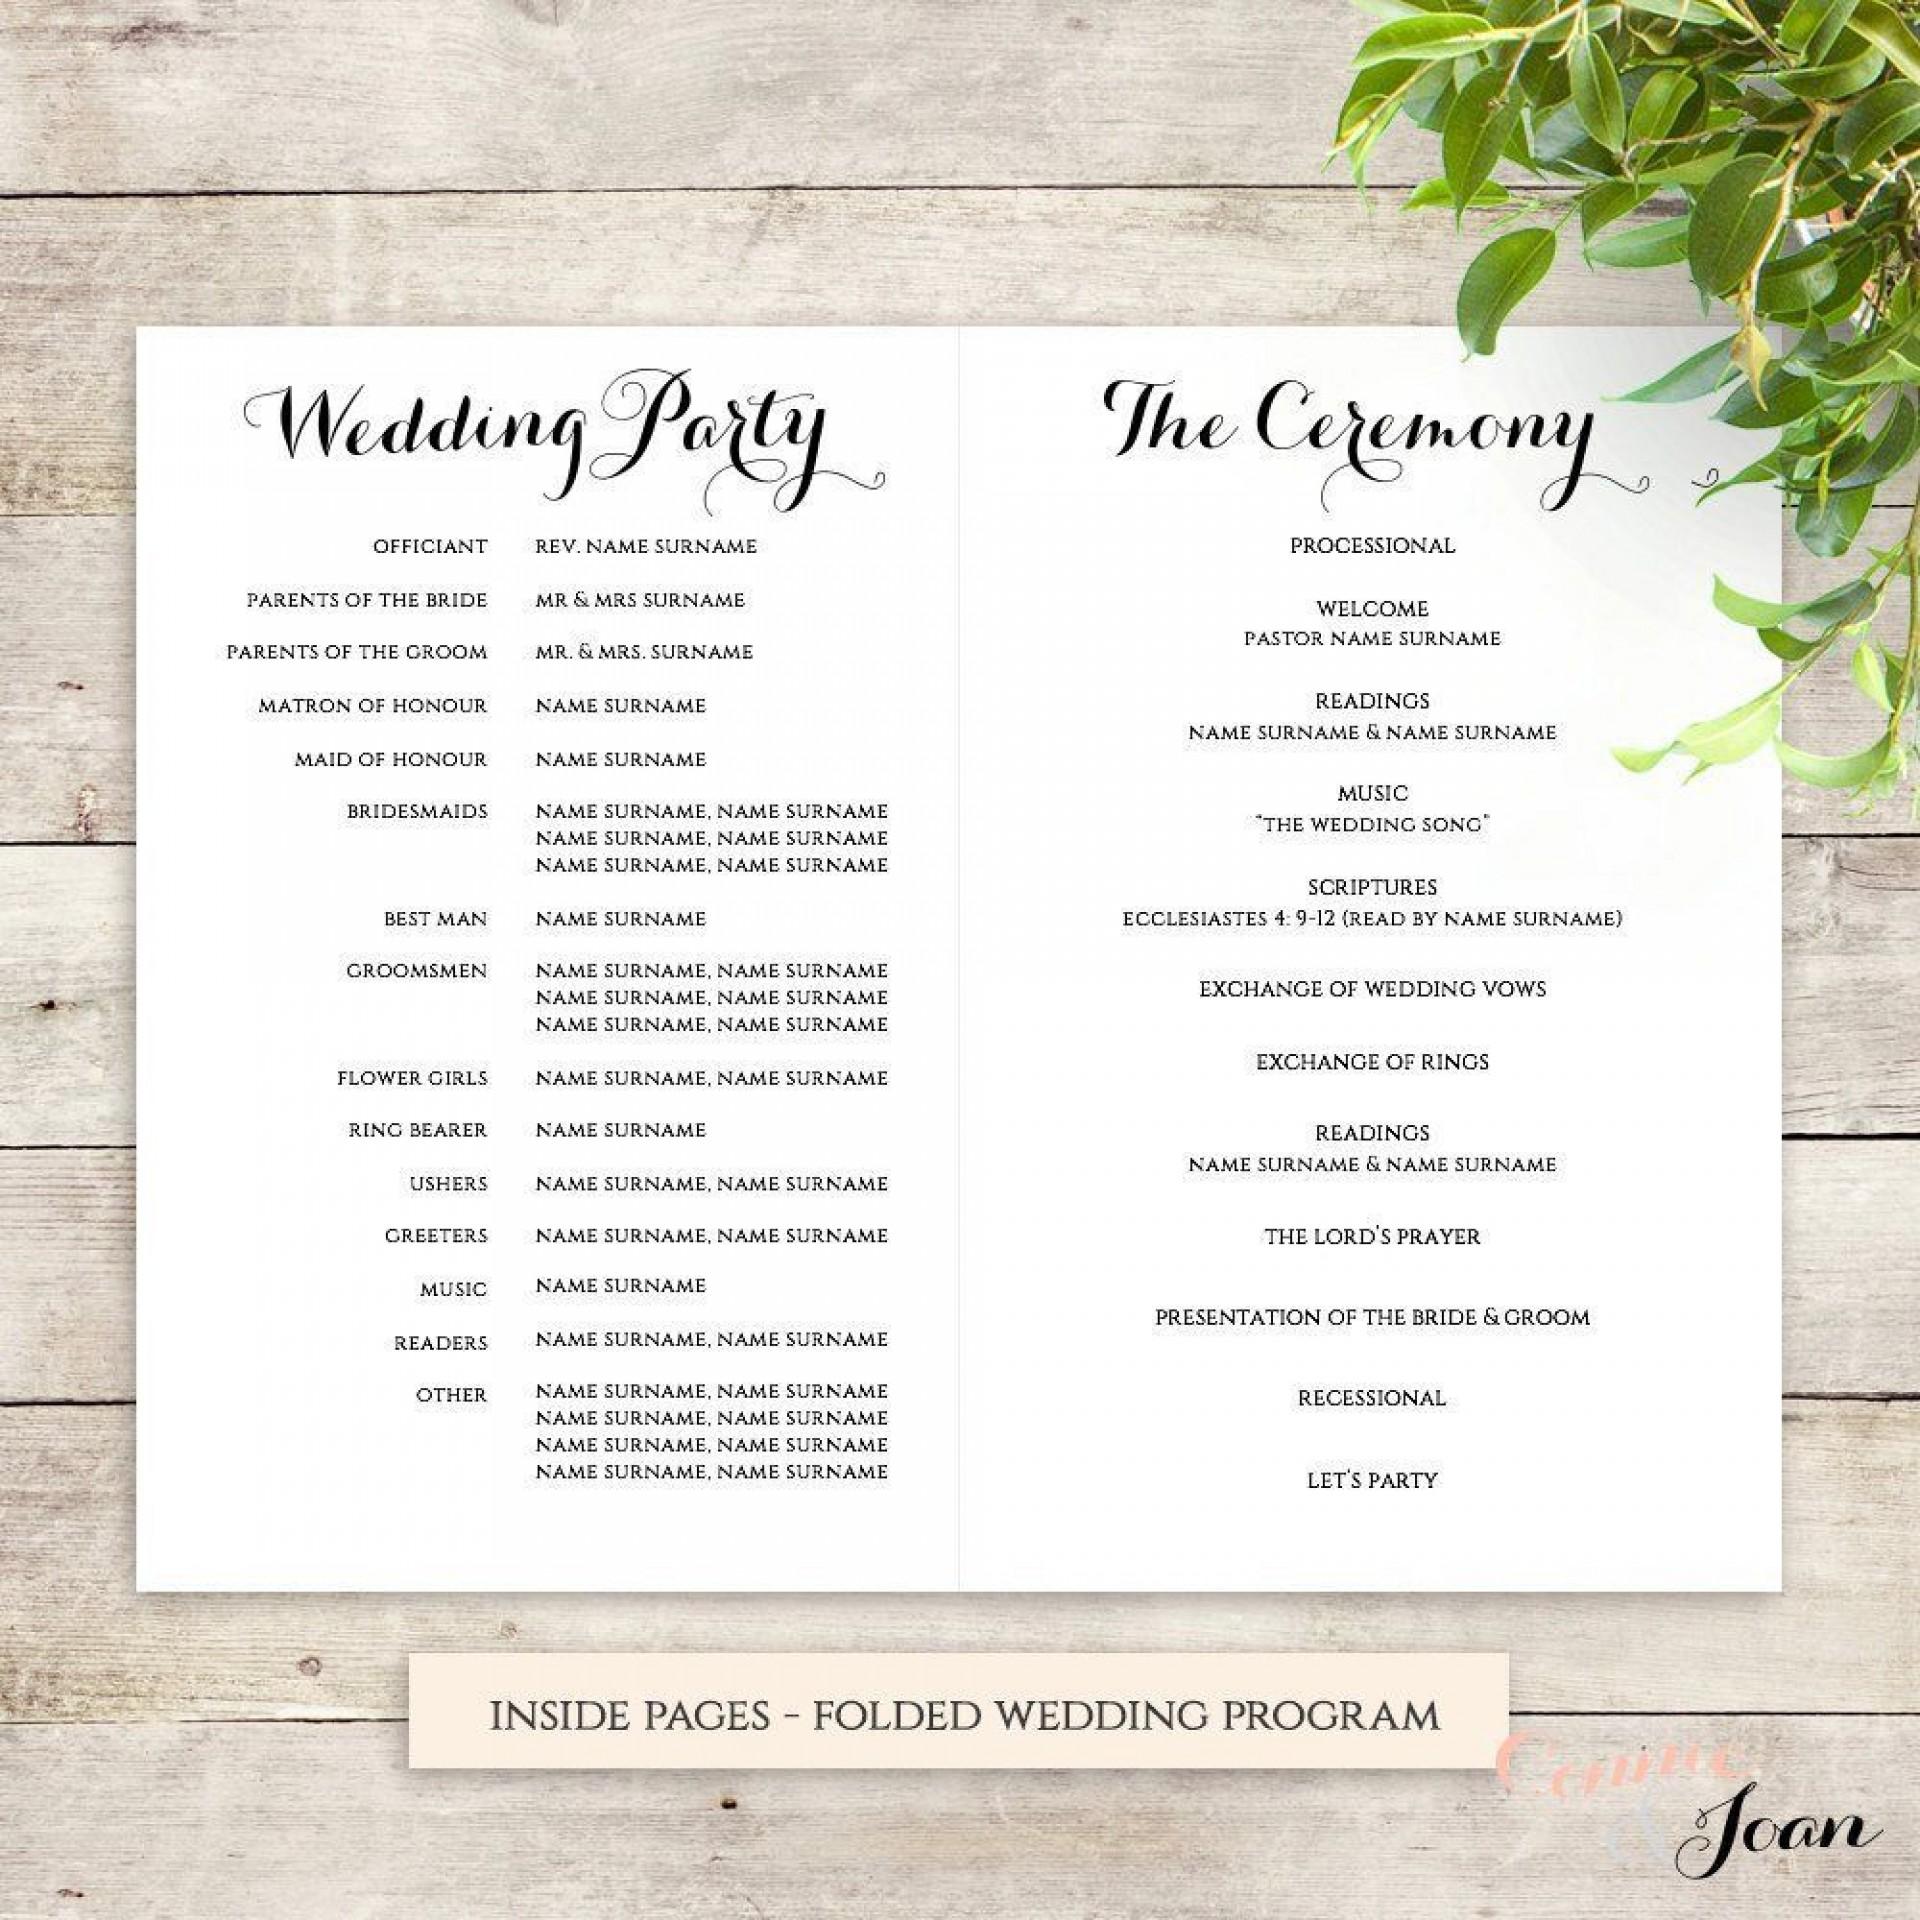 001 Wonderful Wedding Order Of Service Template Image  Pdf Publisher Microsoft Word1920